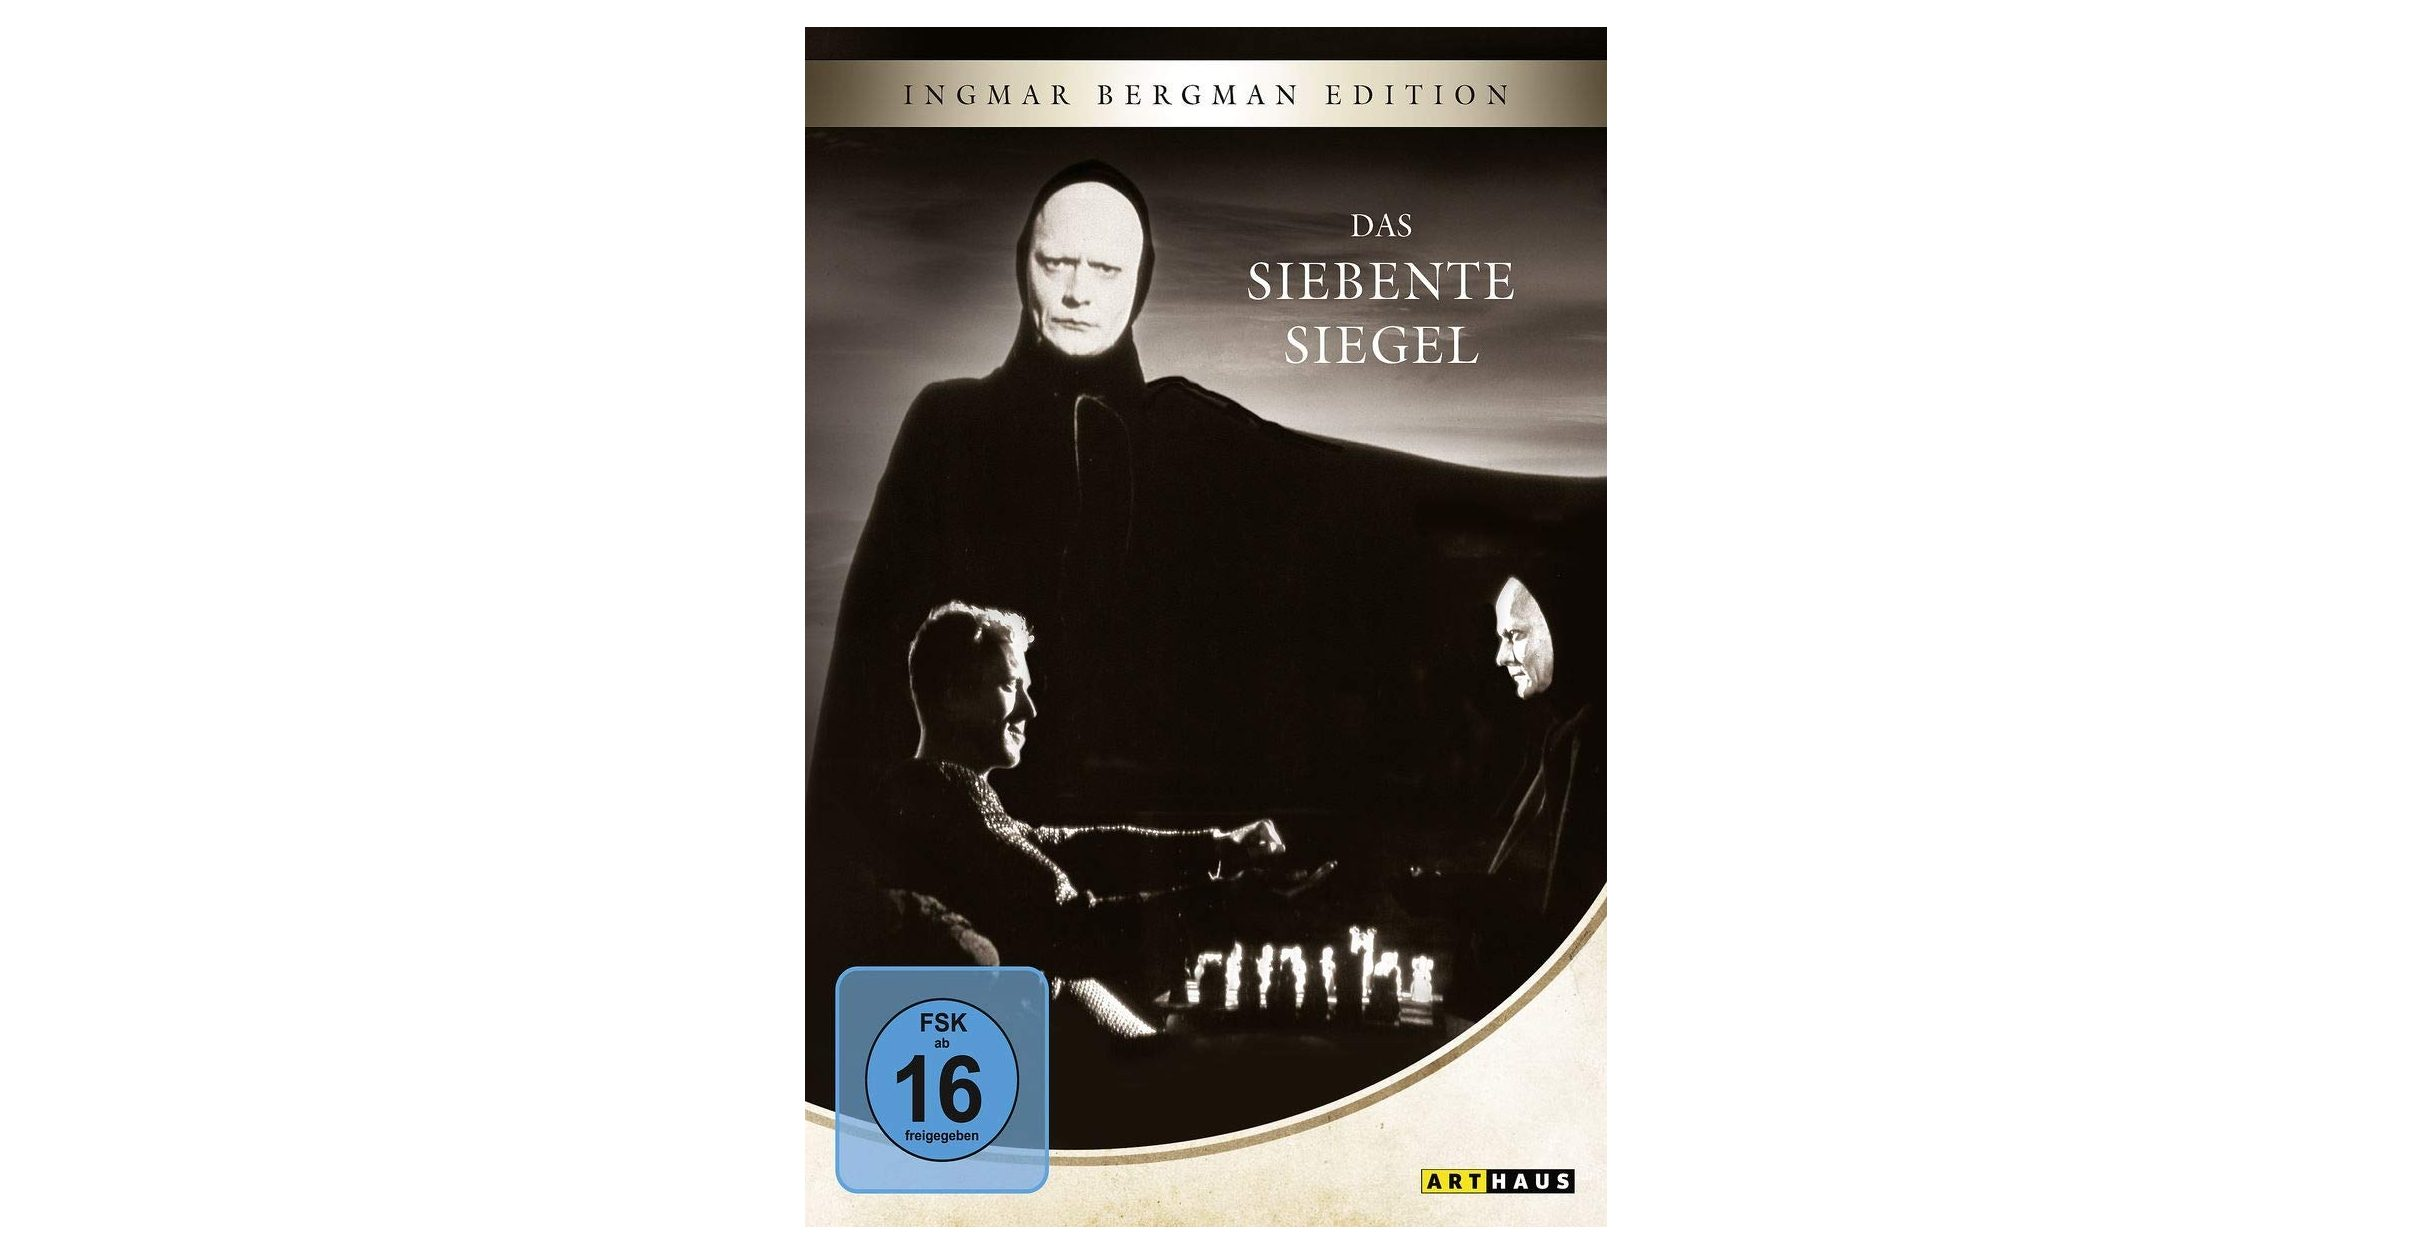 Das_siebente_Siegel-Packshot-DVD-Ingmar-Bergman-Edition